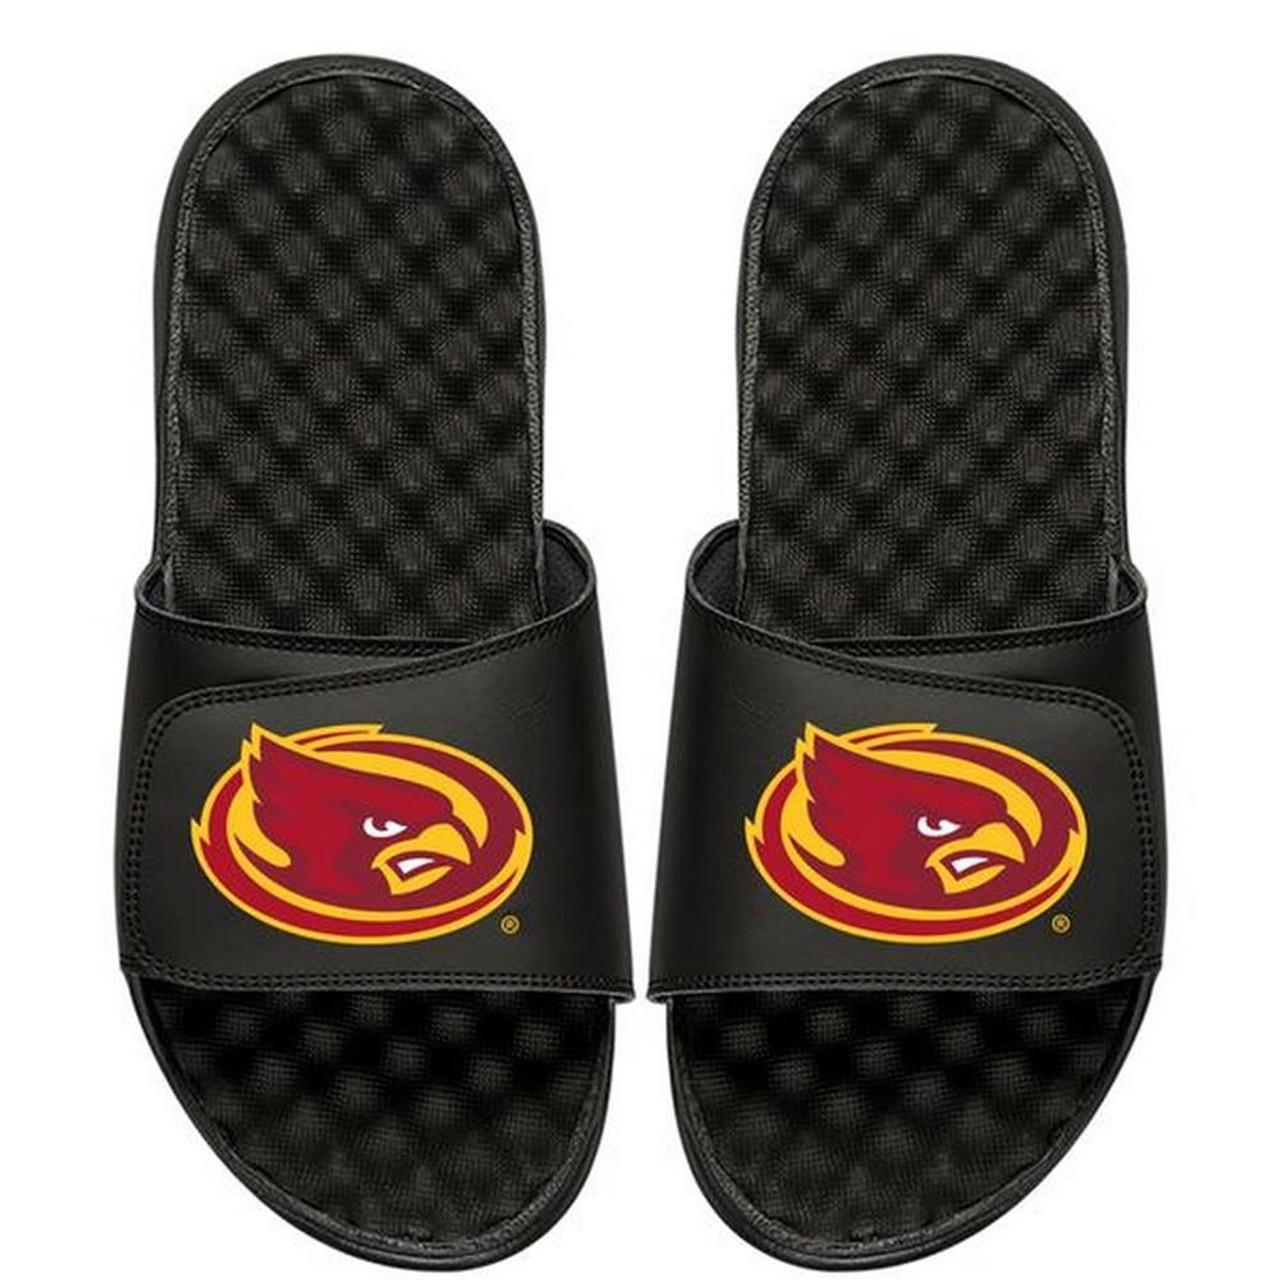 Iowa State Cyclones Slides ISlide Primary Adjustable Sandals